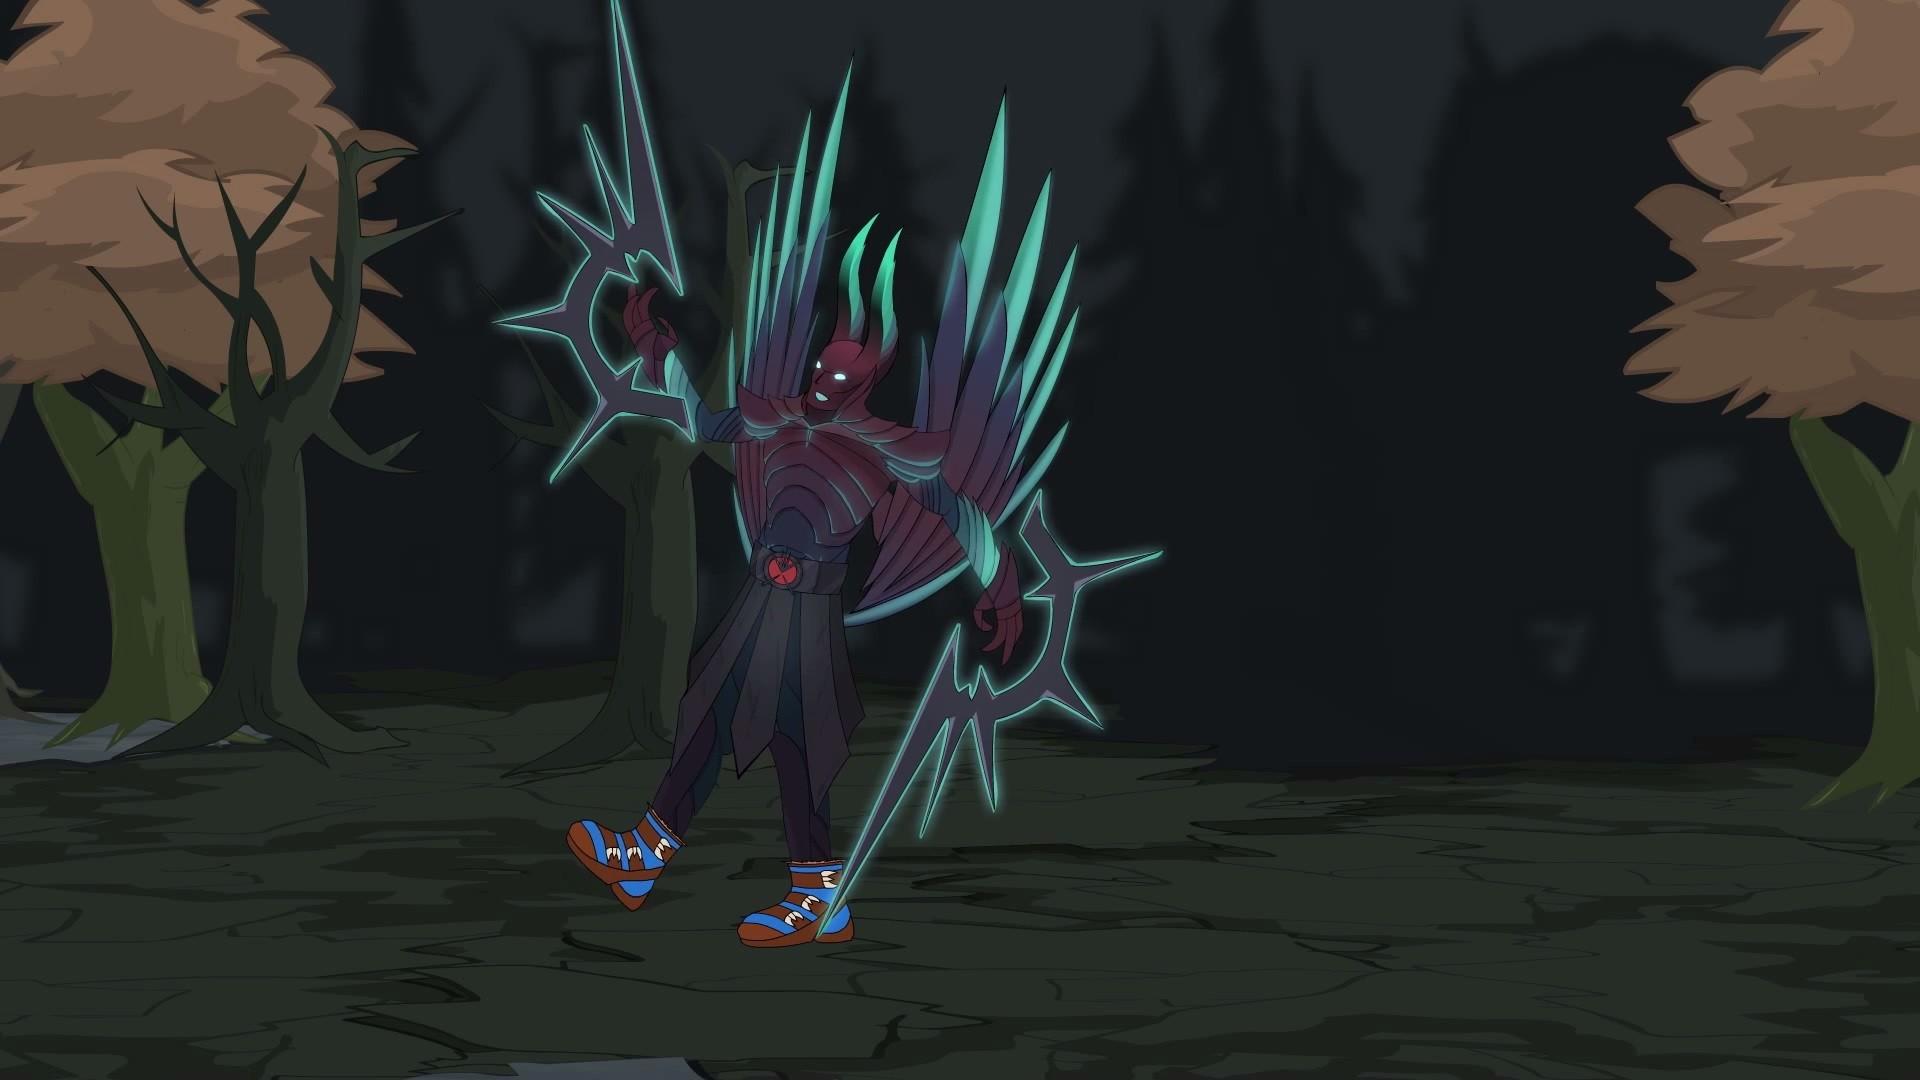 Illustration Video Games Anime Dota 2 Terrorblade Screenshot Fictional Character